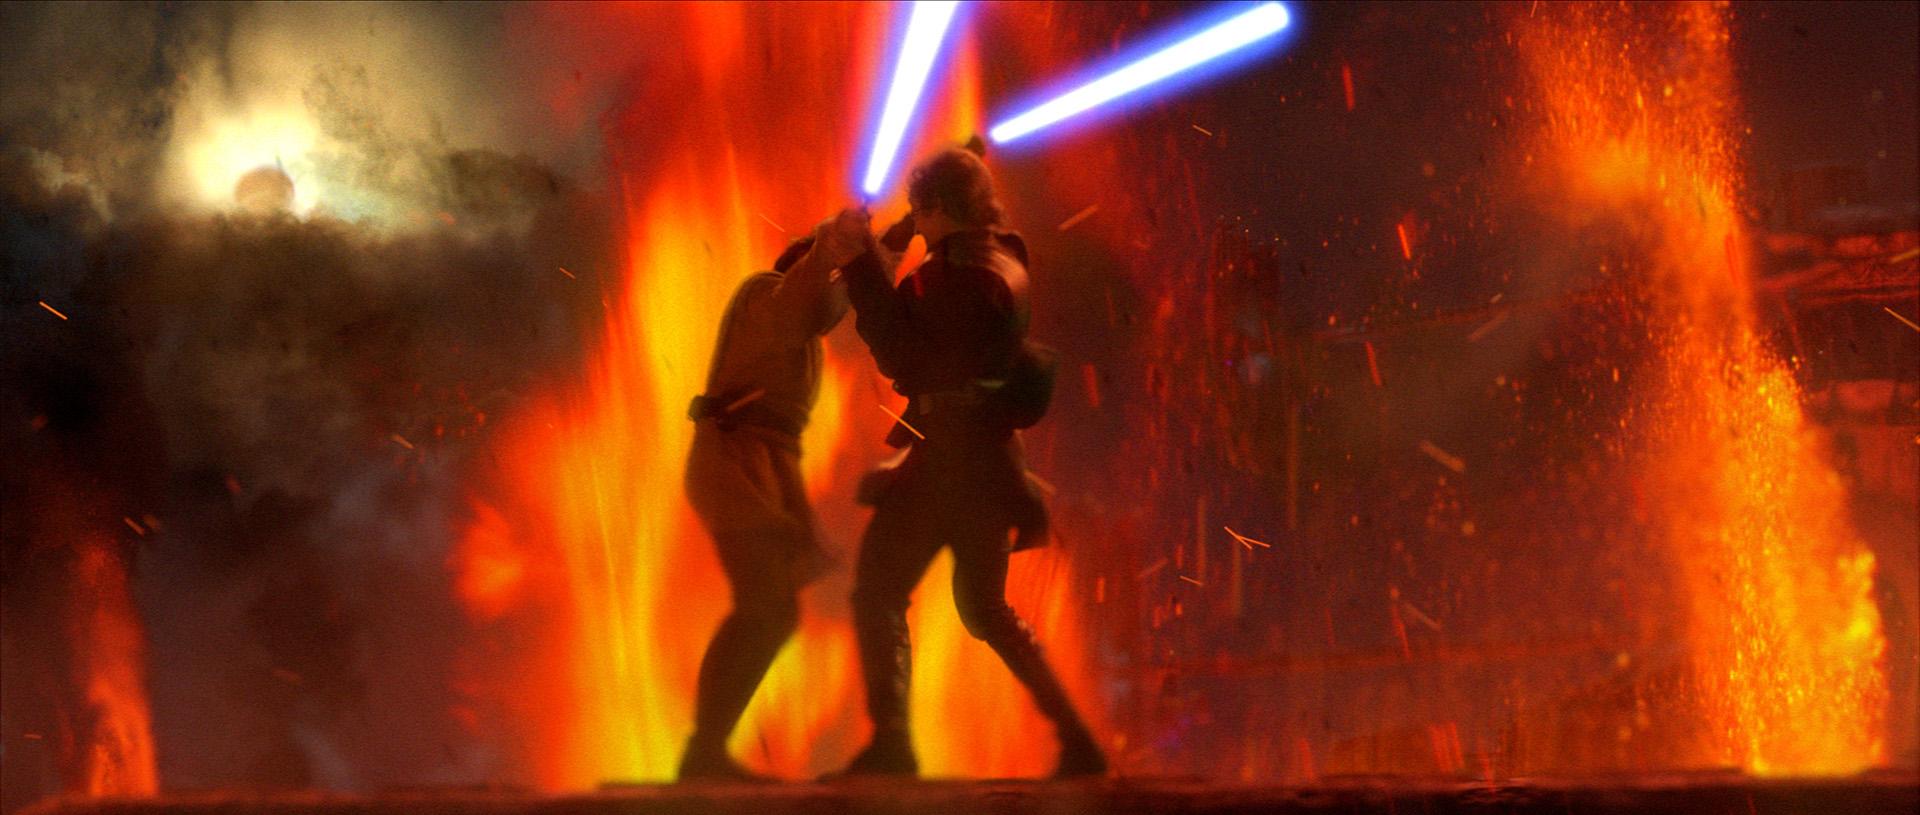 Star Wars Episode 3: Revenge of the Sith | Lucasfilm.com